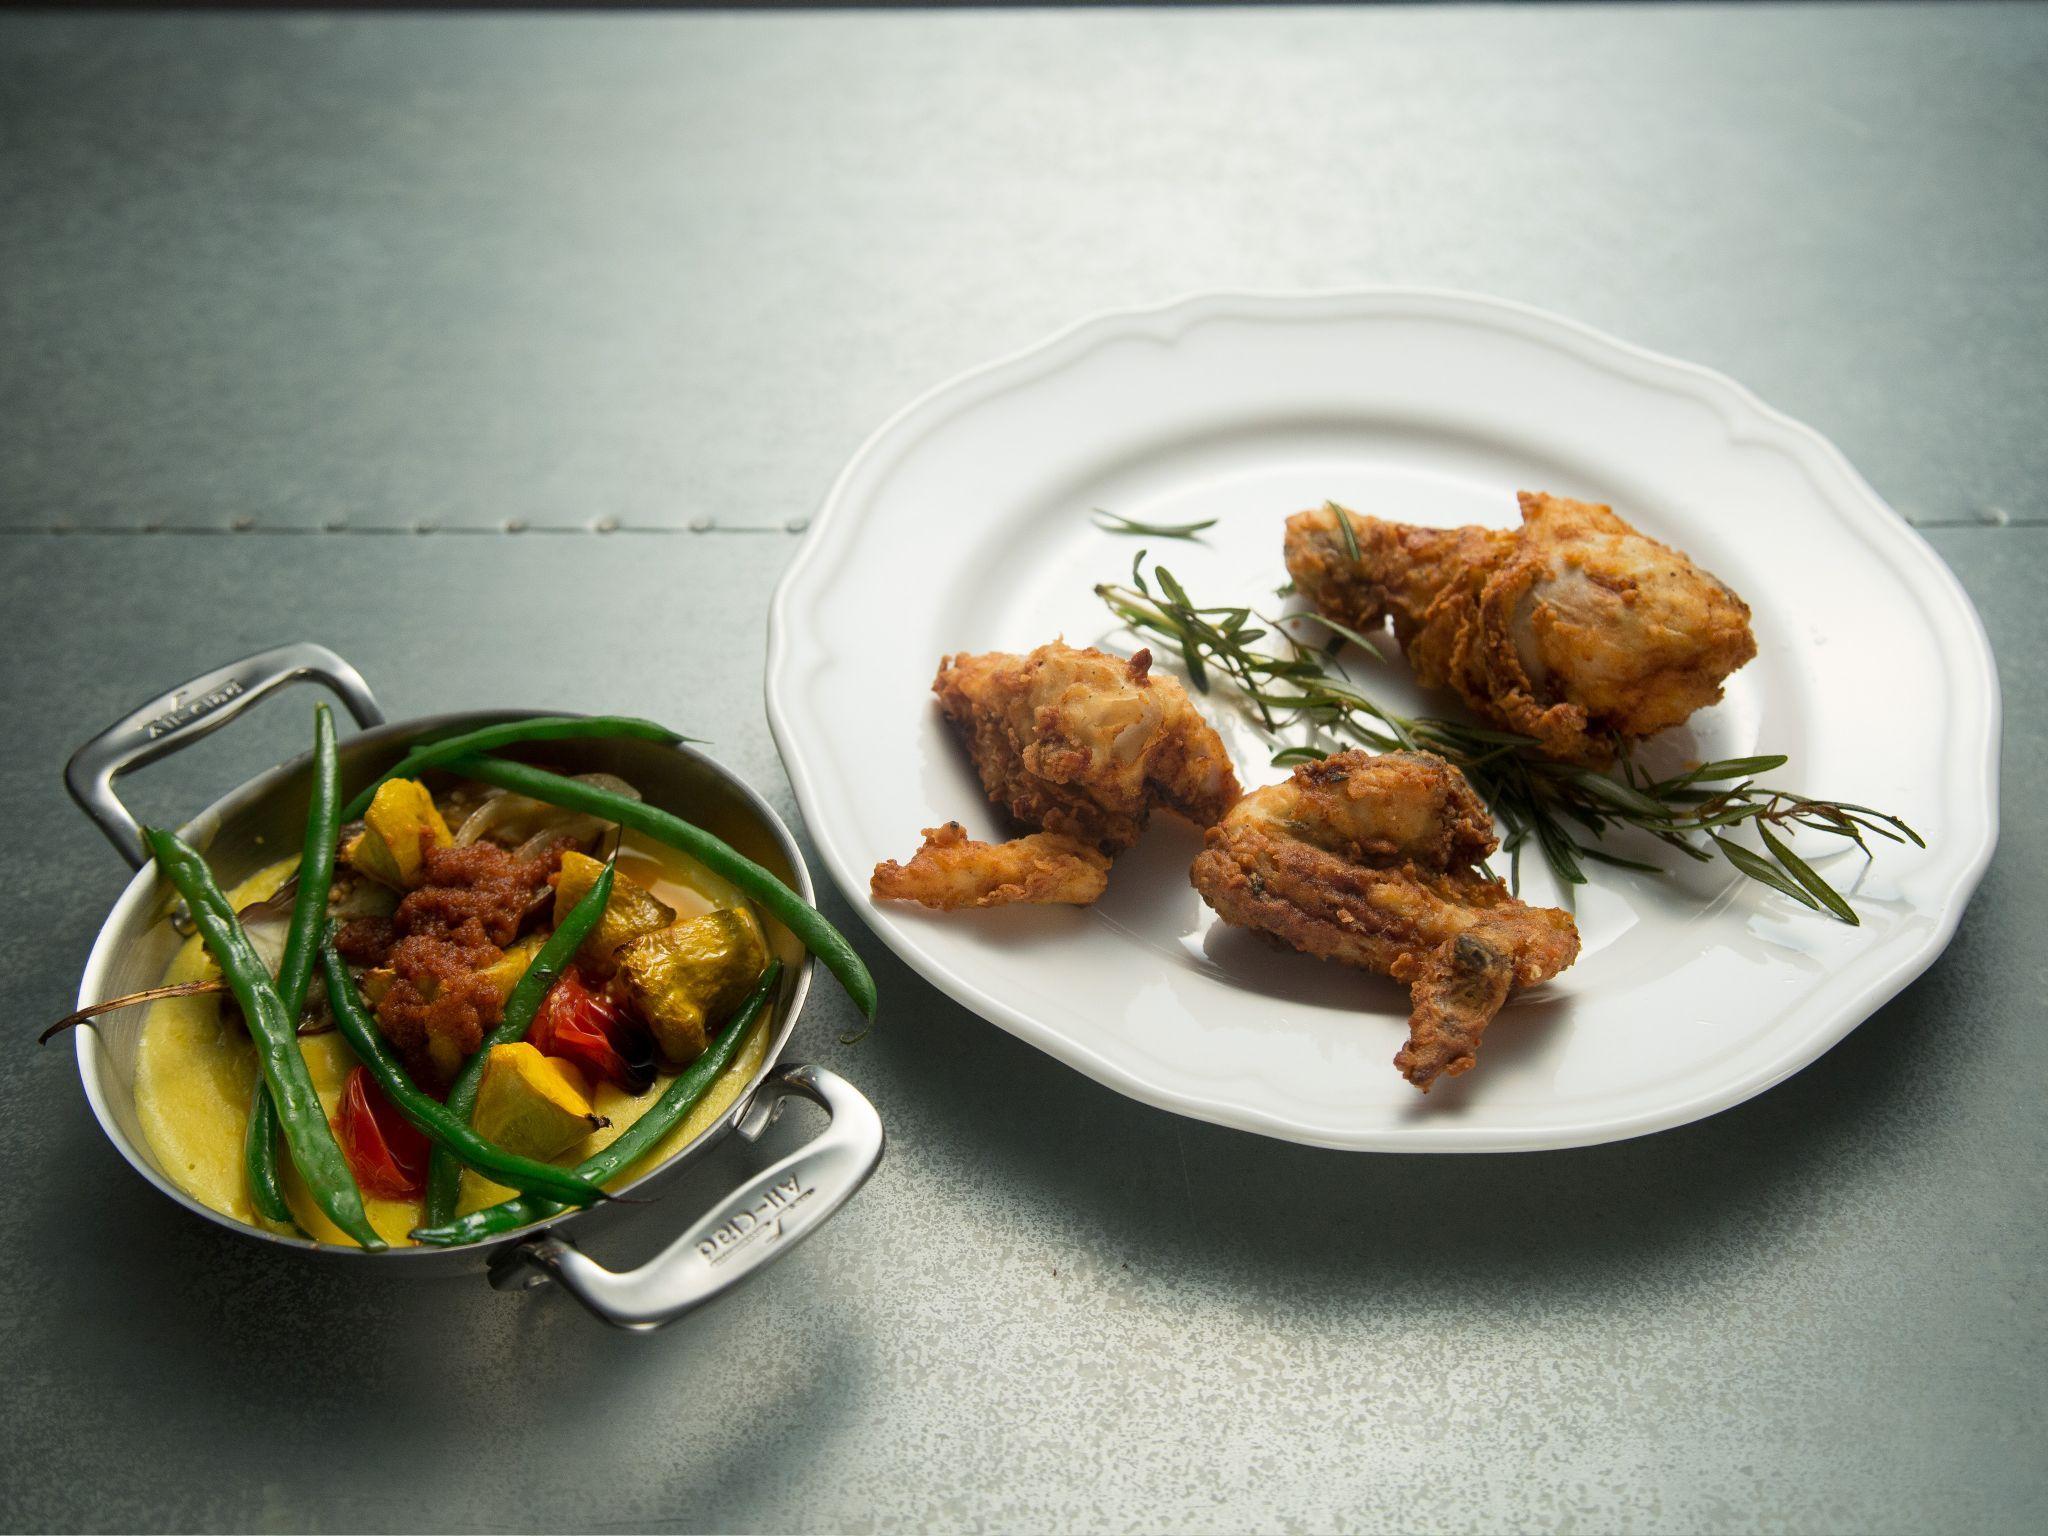 Extra crispy fried chicken recipe tyler florence crispy fried extra crispy fried chicken food network recipeschef forumfinder Image collections